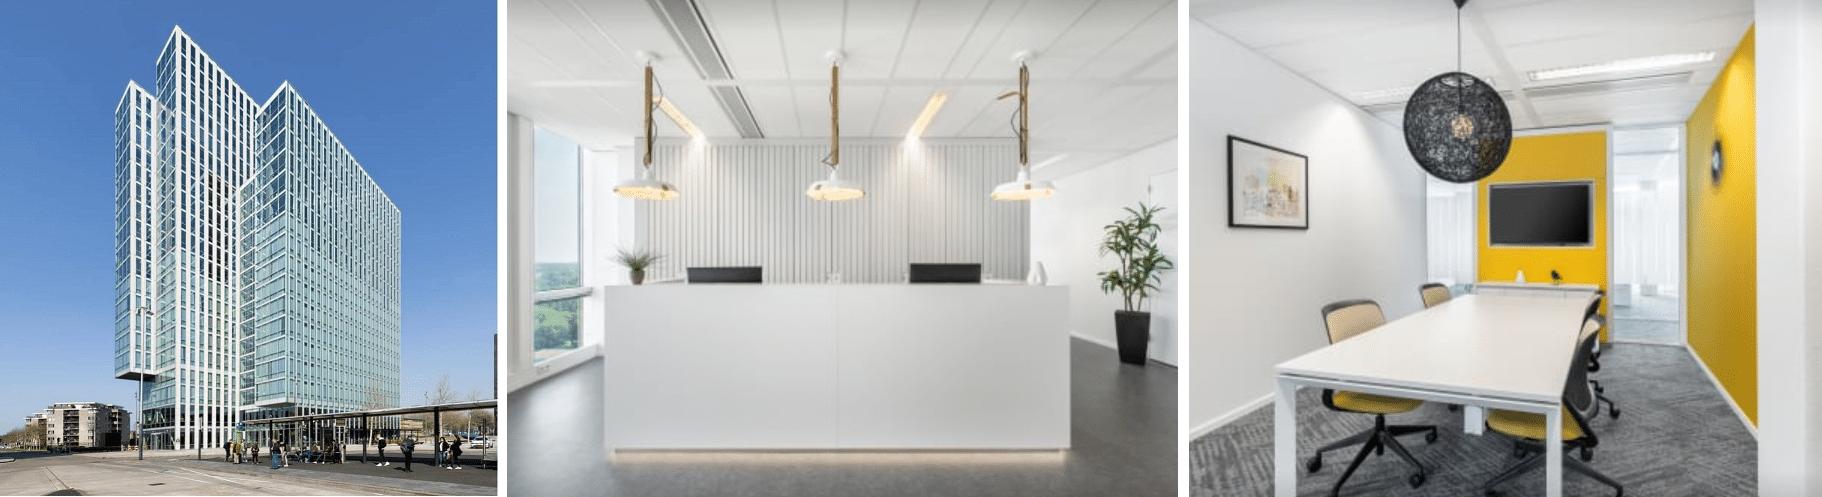 Kantoor Seotech Almere